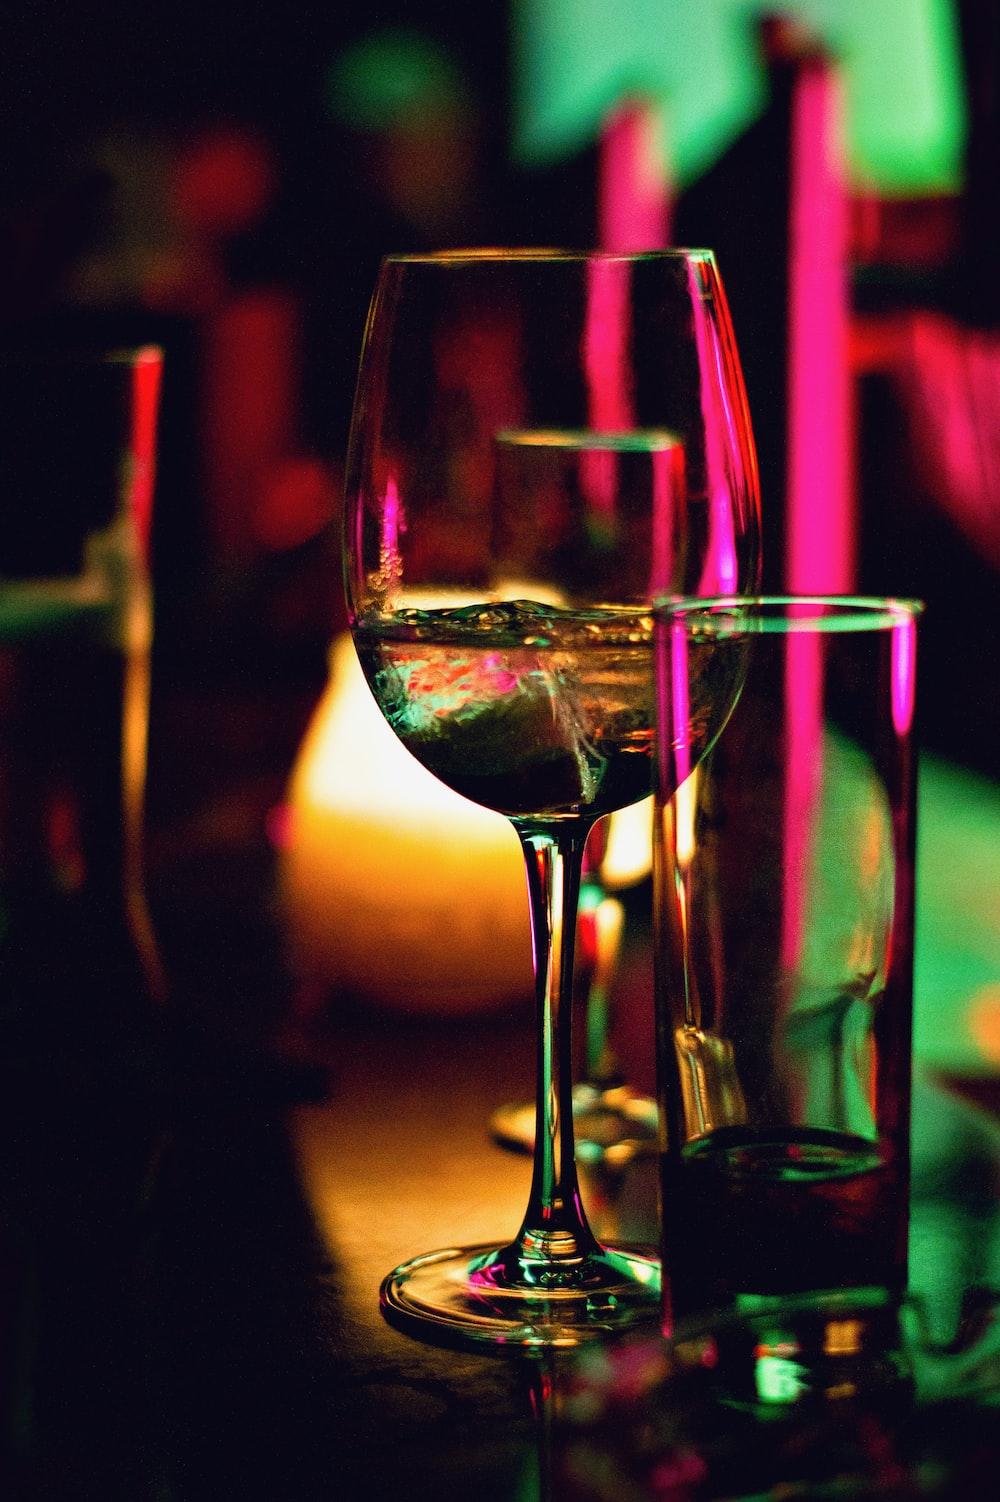 half filled wine glass beside half empty clear pint glass